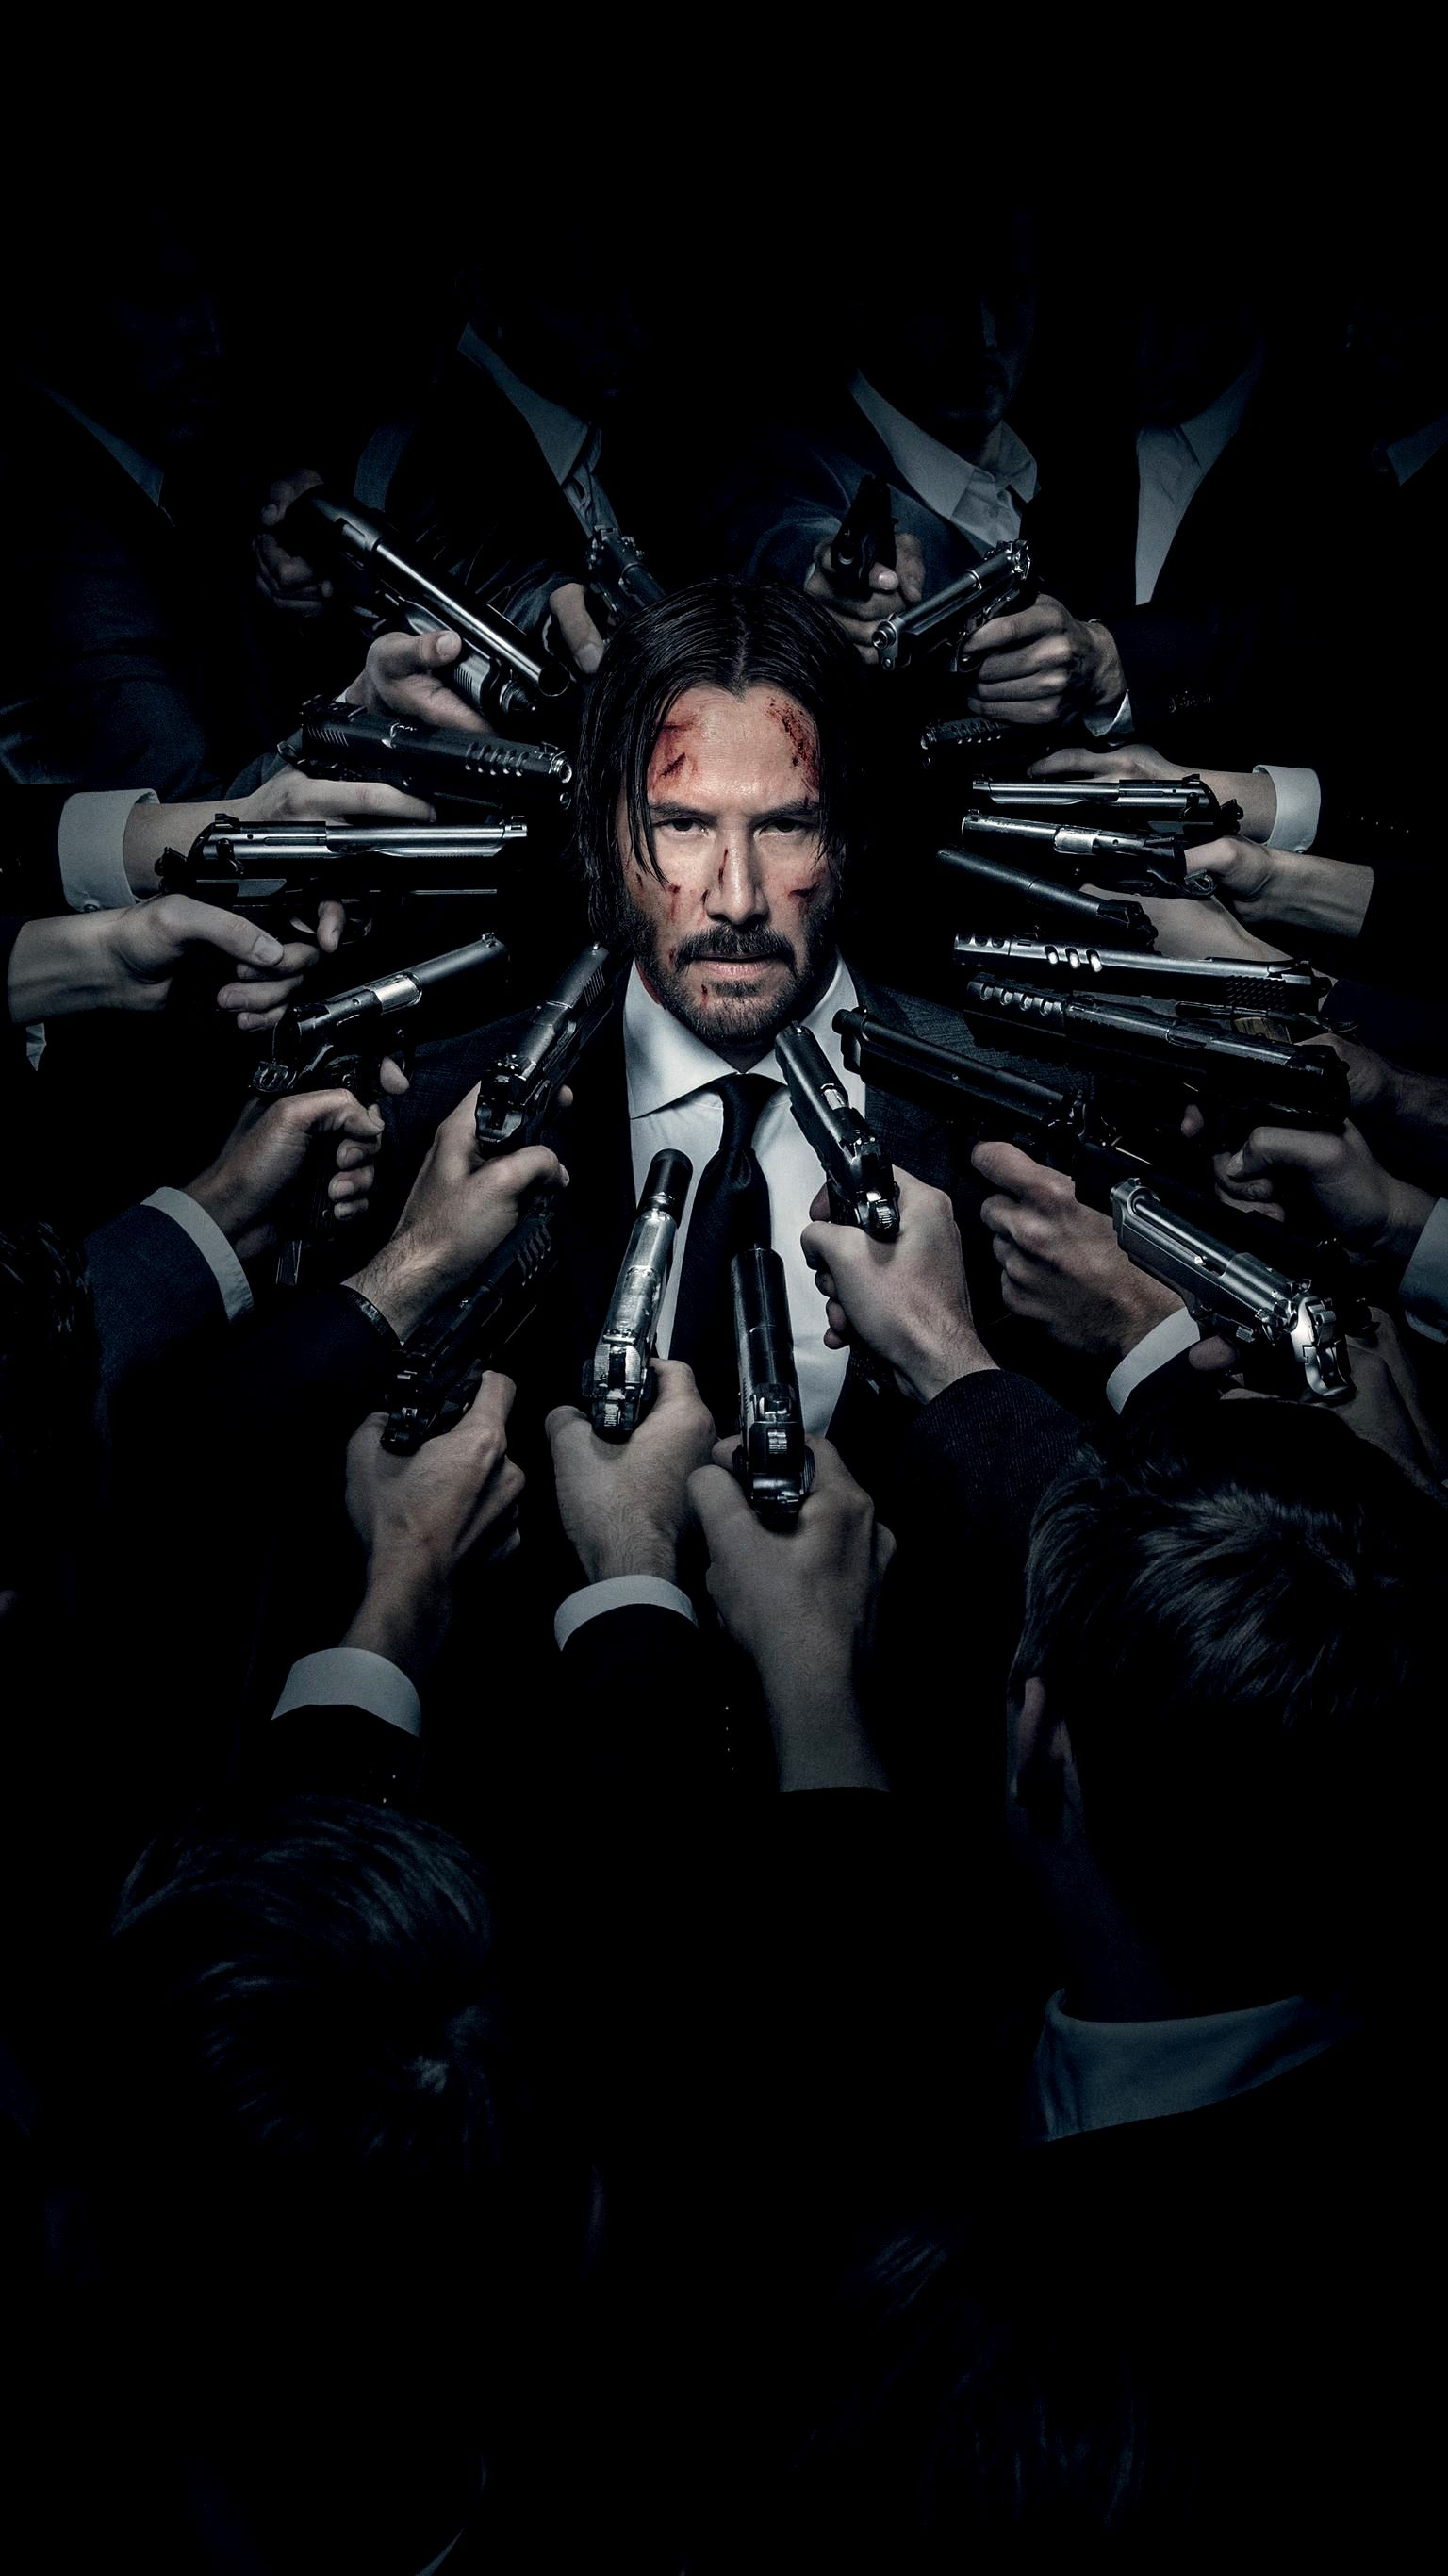 John Wick Wallpaper 4k Iphone Trick John Wick Hd John Wick Movie Keanu Reeves John Wick